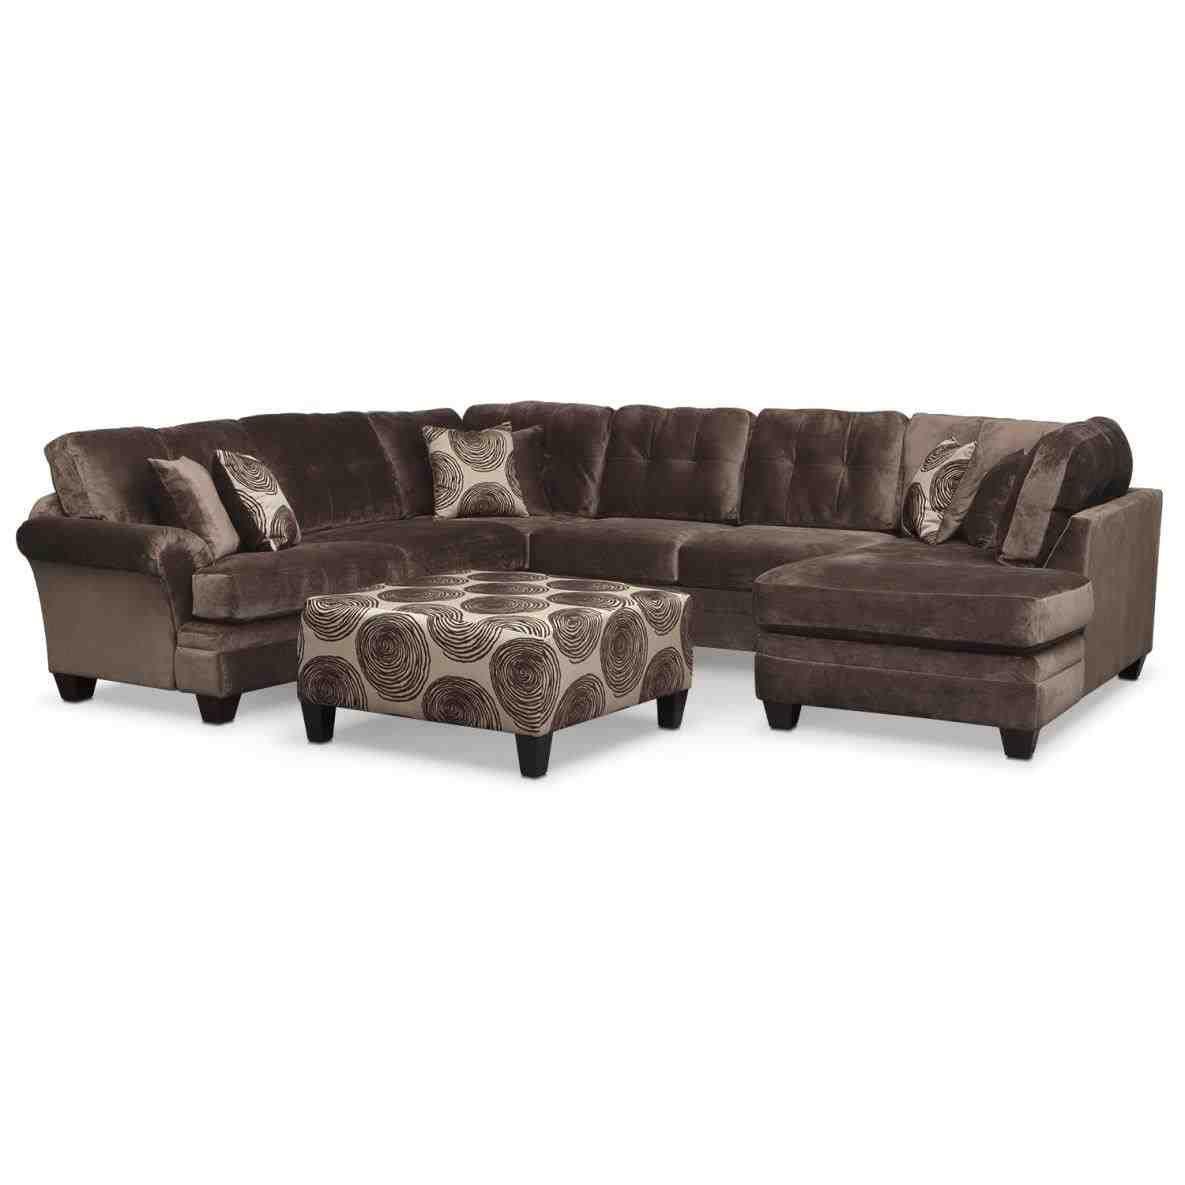 Best Cheap Living Room Furniture Sets Under 400 Cheap Living 640 x 480